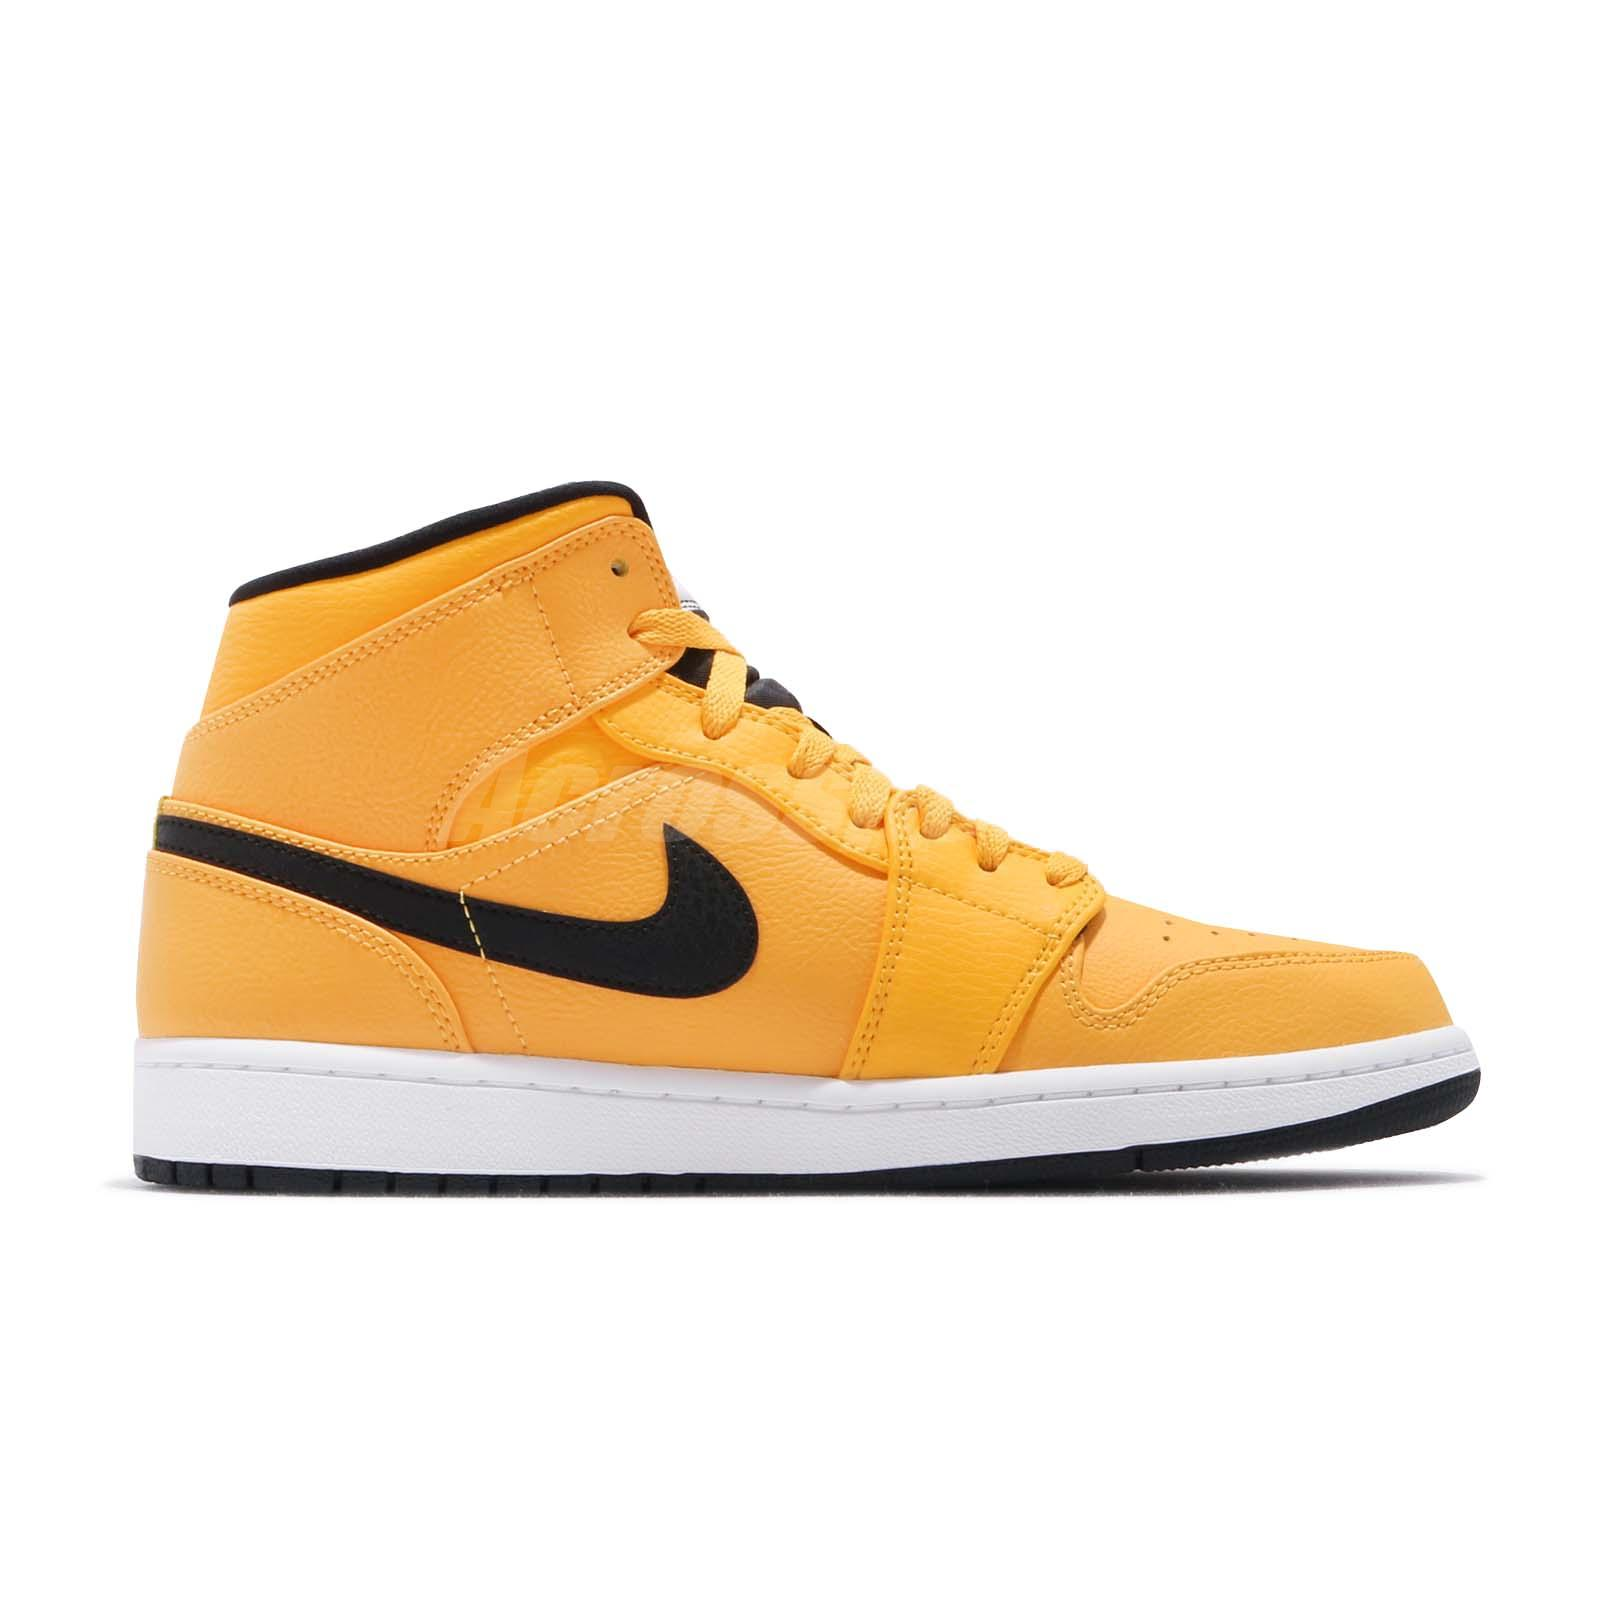 5ccbf8f049782d Nike Air Jordan 1 MID Taxi University Gold Yellow Black AJ1 Sneakers ...